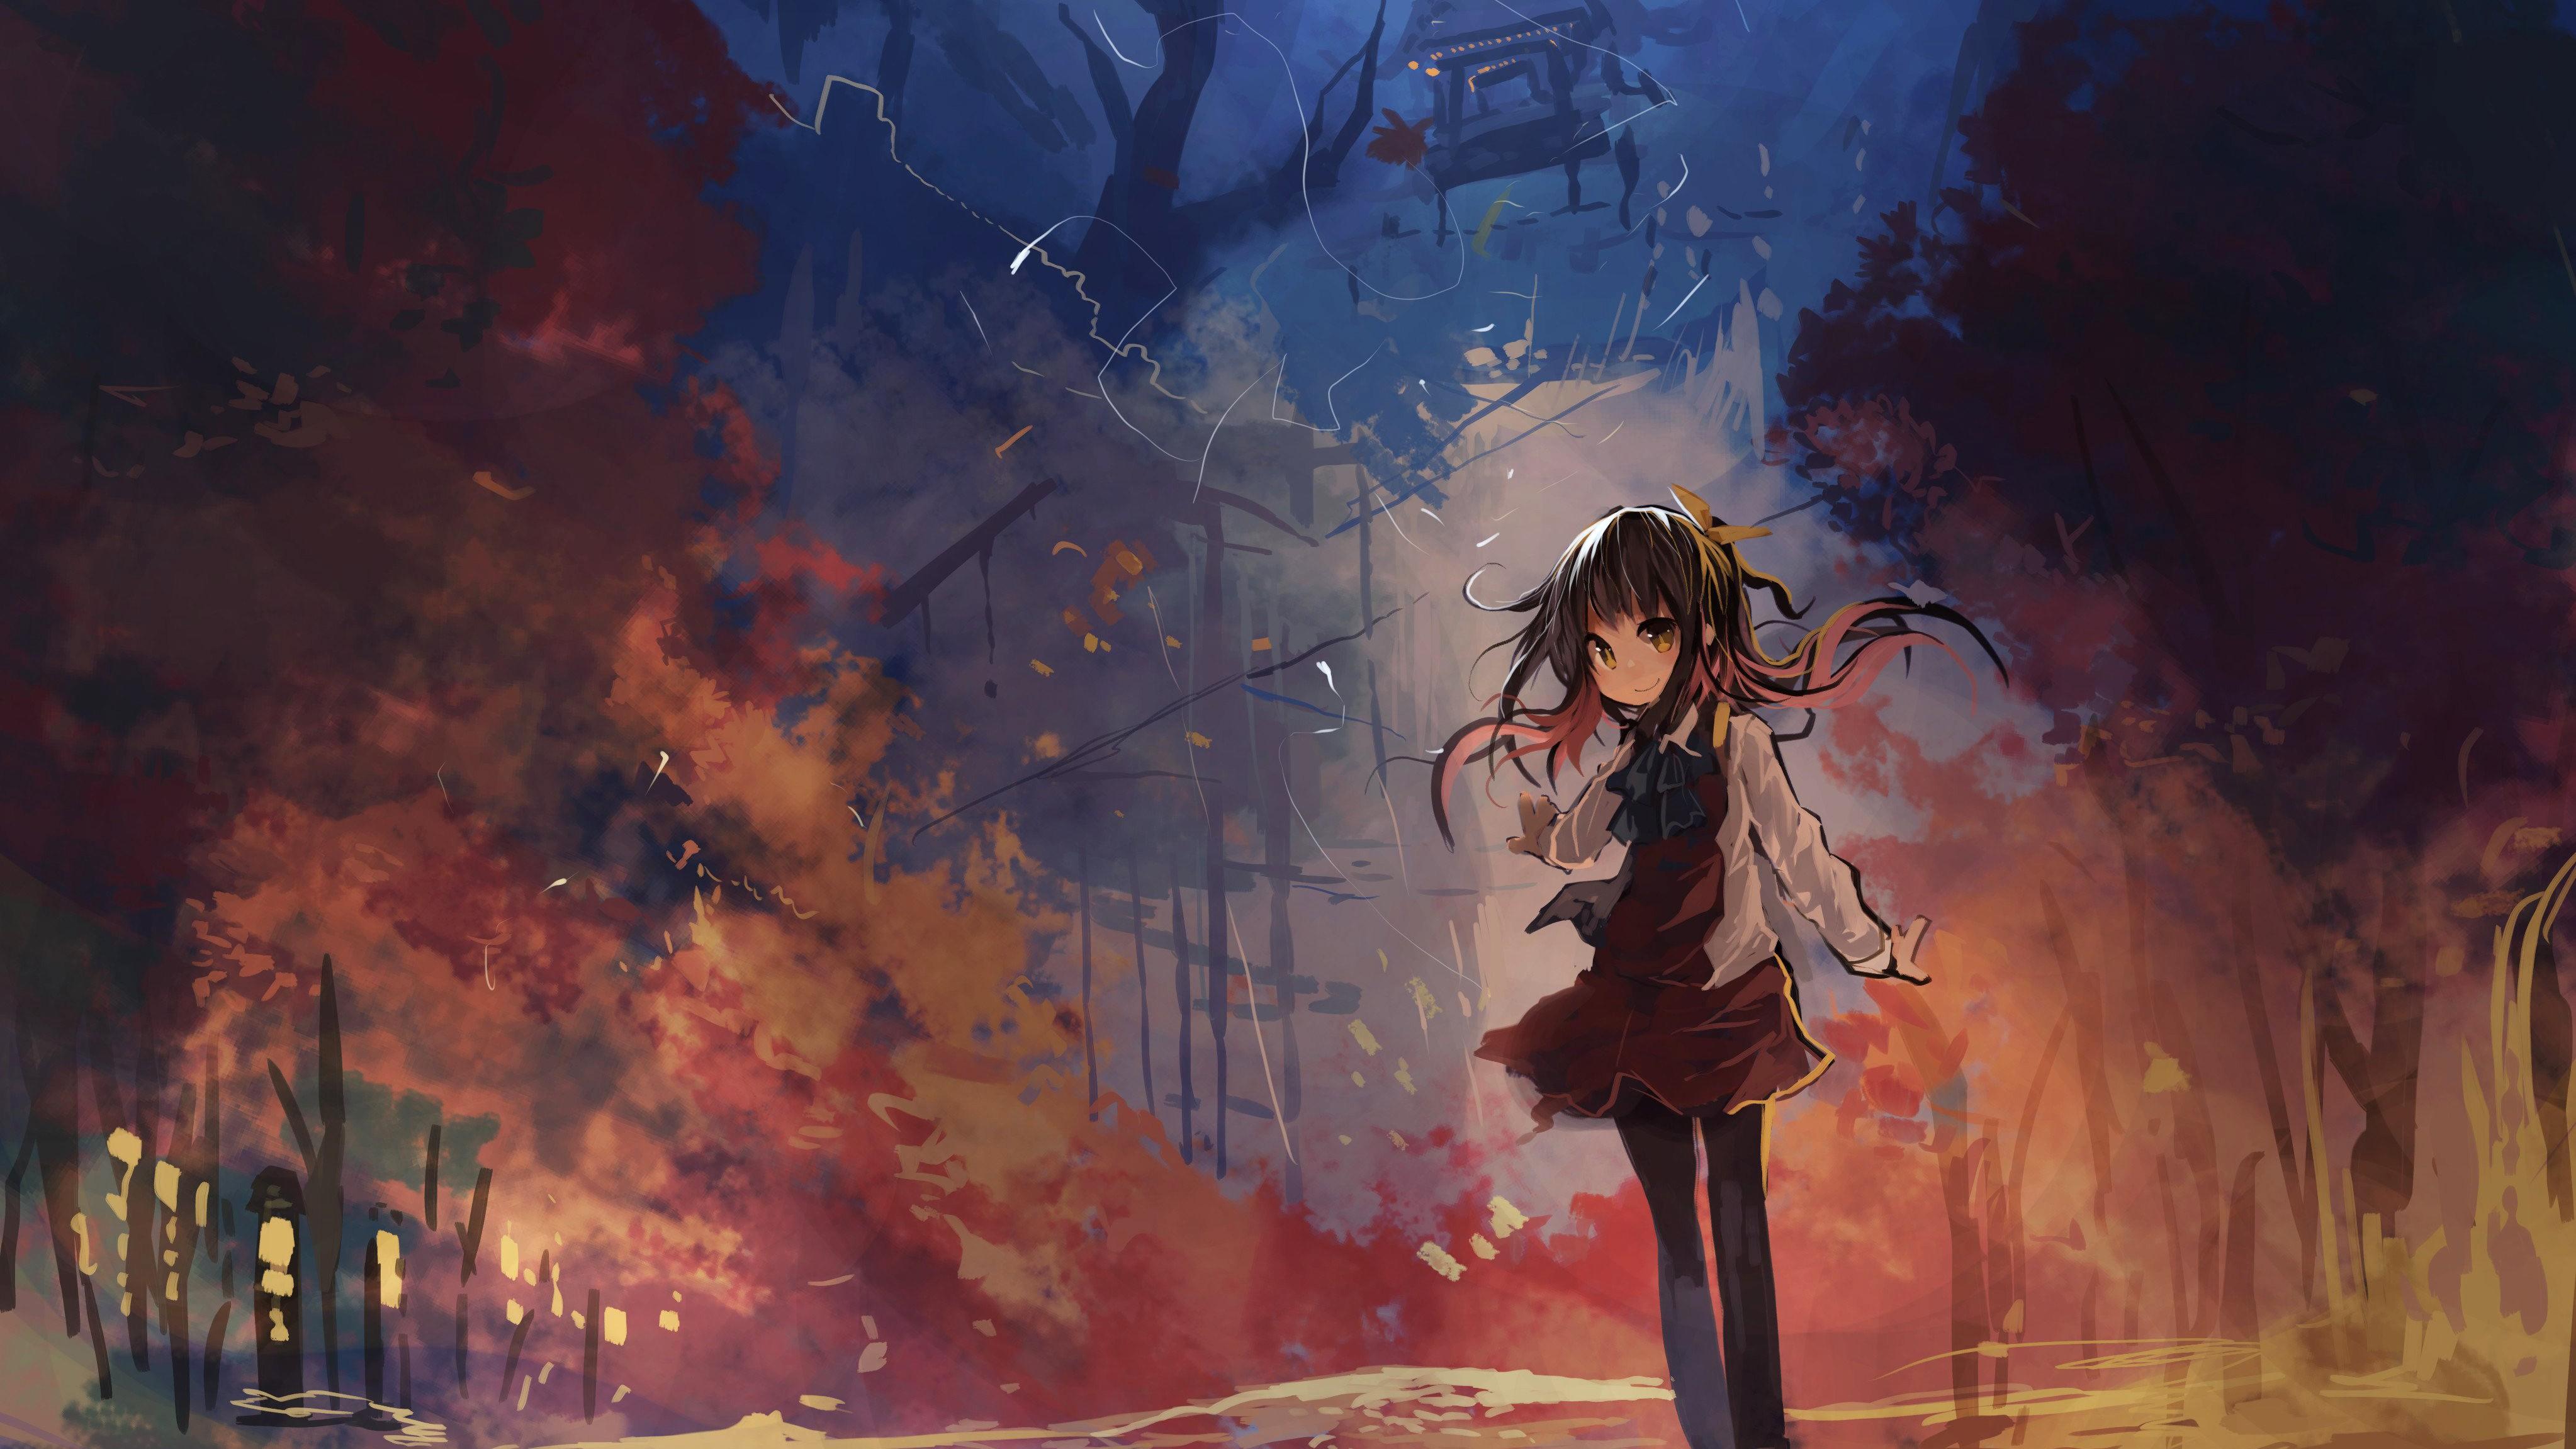 Painting fall anime girls brunette mythology art screenshot computer wallpaper